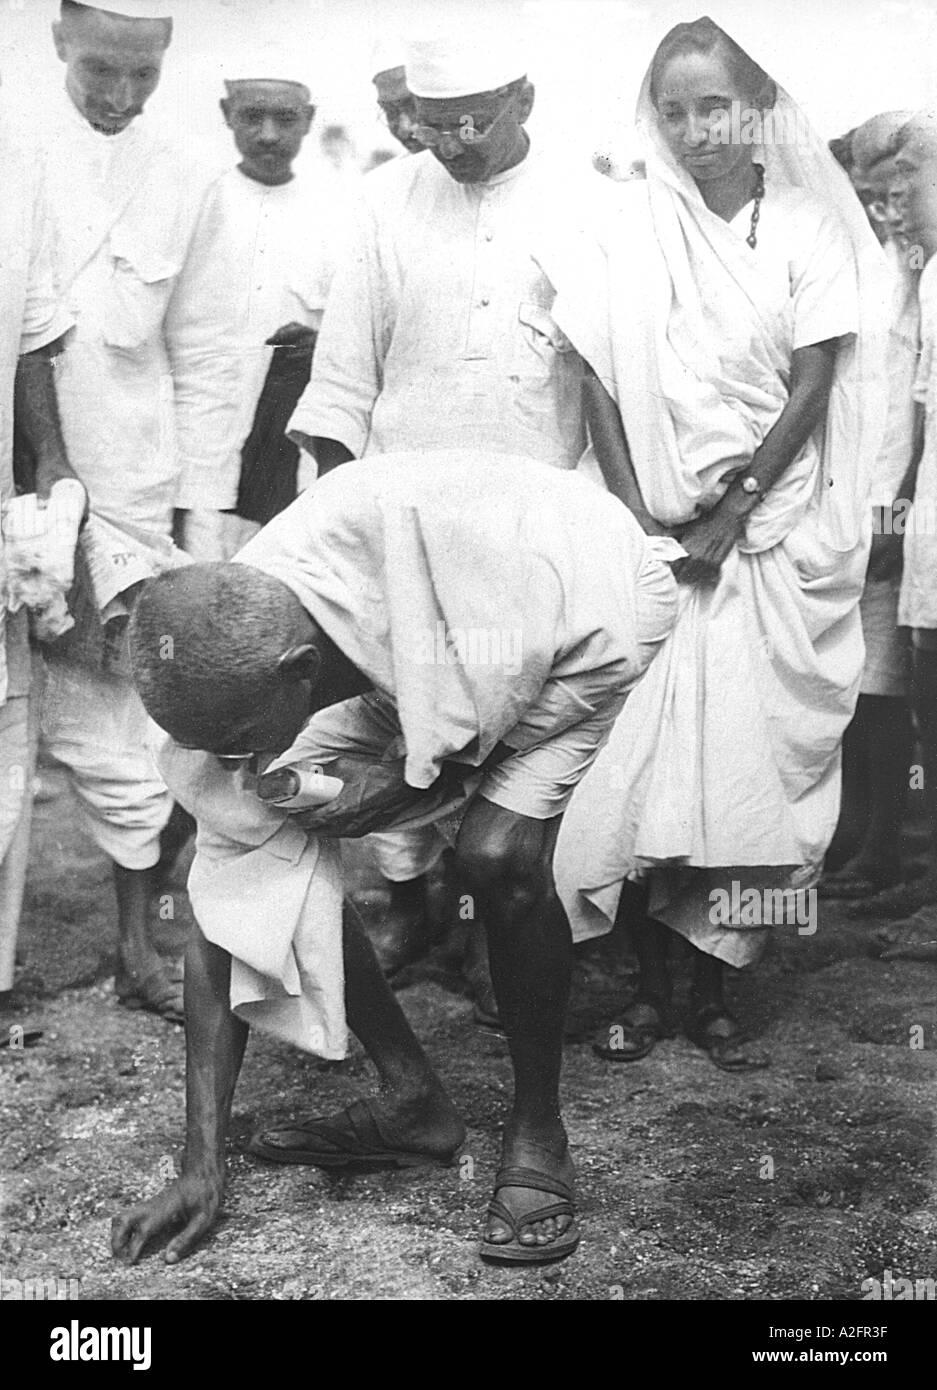 Mahatma Gandhi breaking the salt law by picking up a lump of natural salt at Dandi Gujarat India 6 April 1930 at 8-30 am - Stock Image